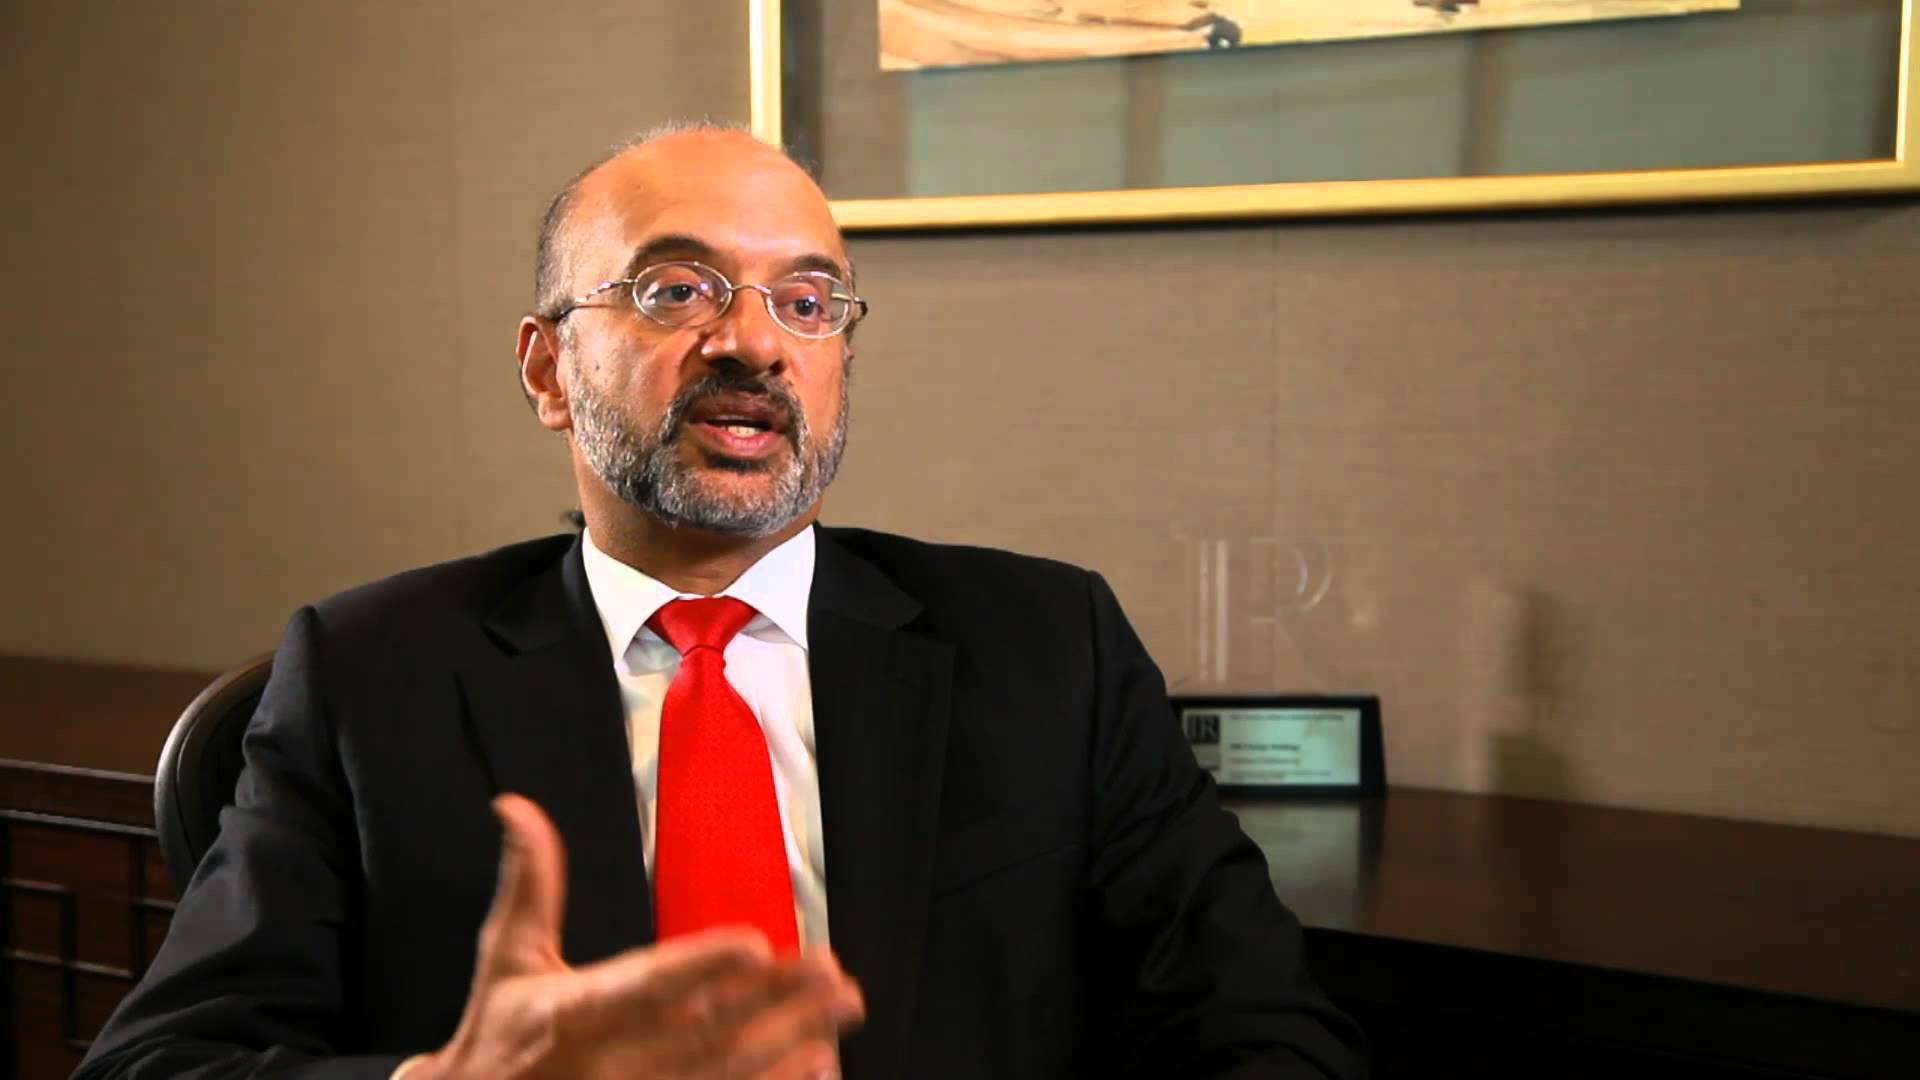 Piyush Gupta, Group CEO of DBS Group Holdings